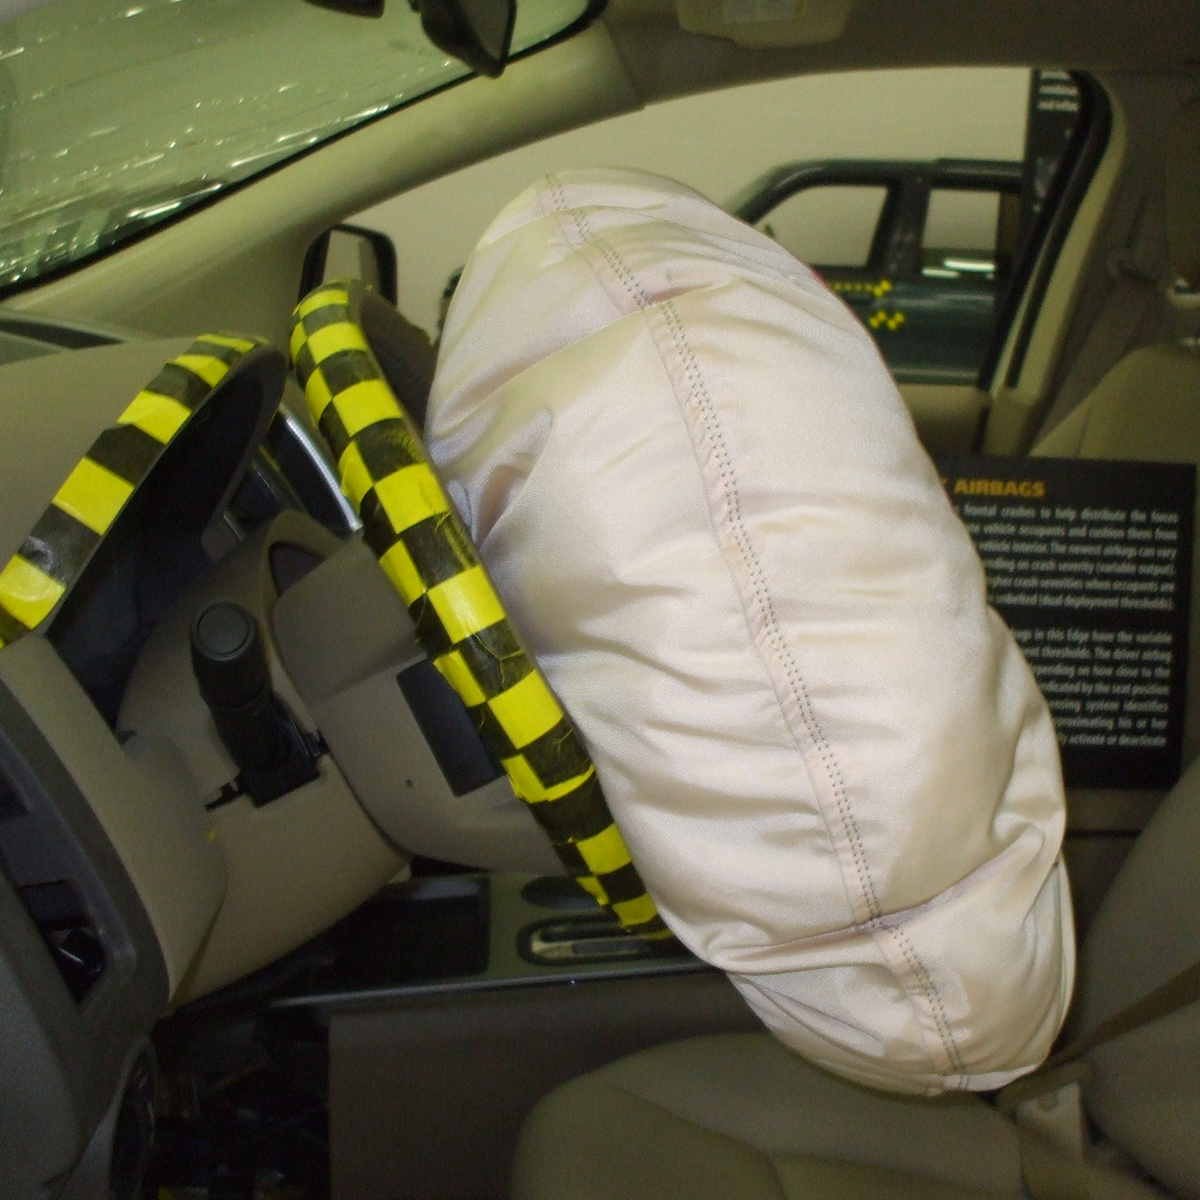 Airbag warning light is on inspection | AutoGuru